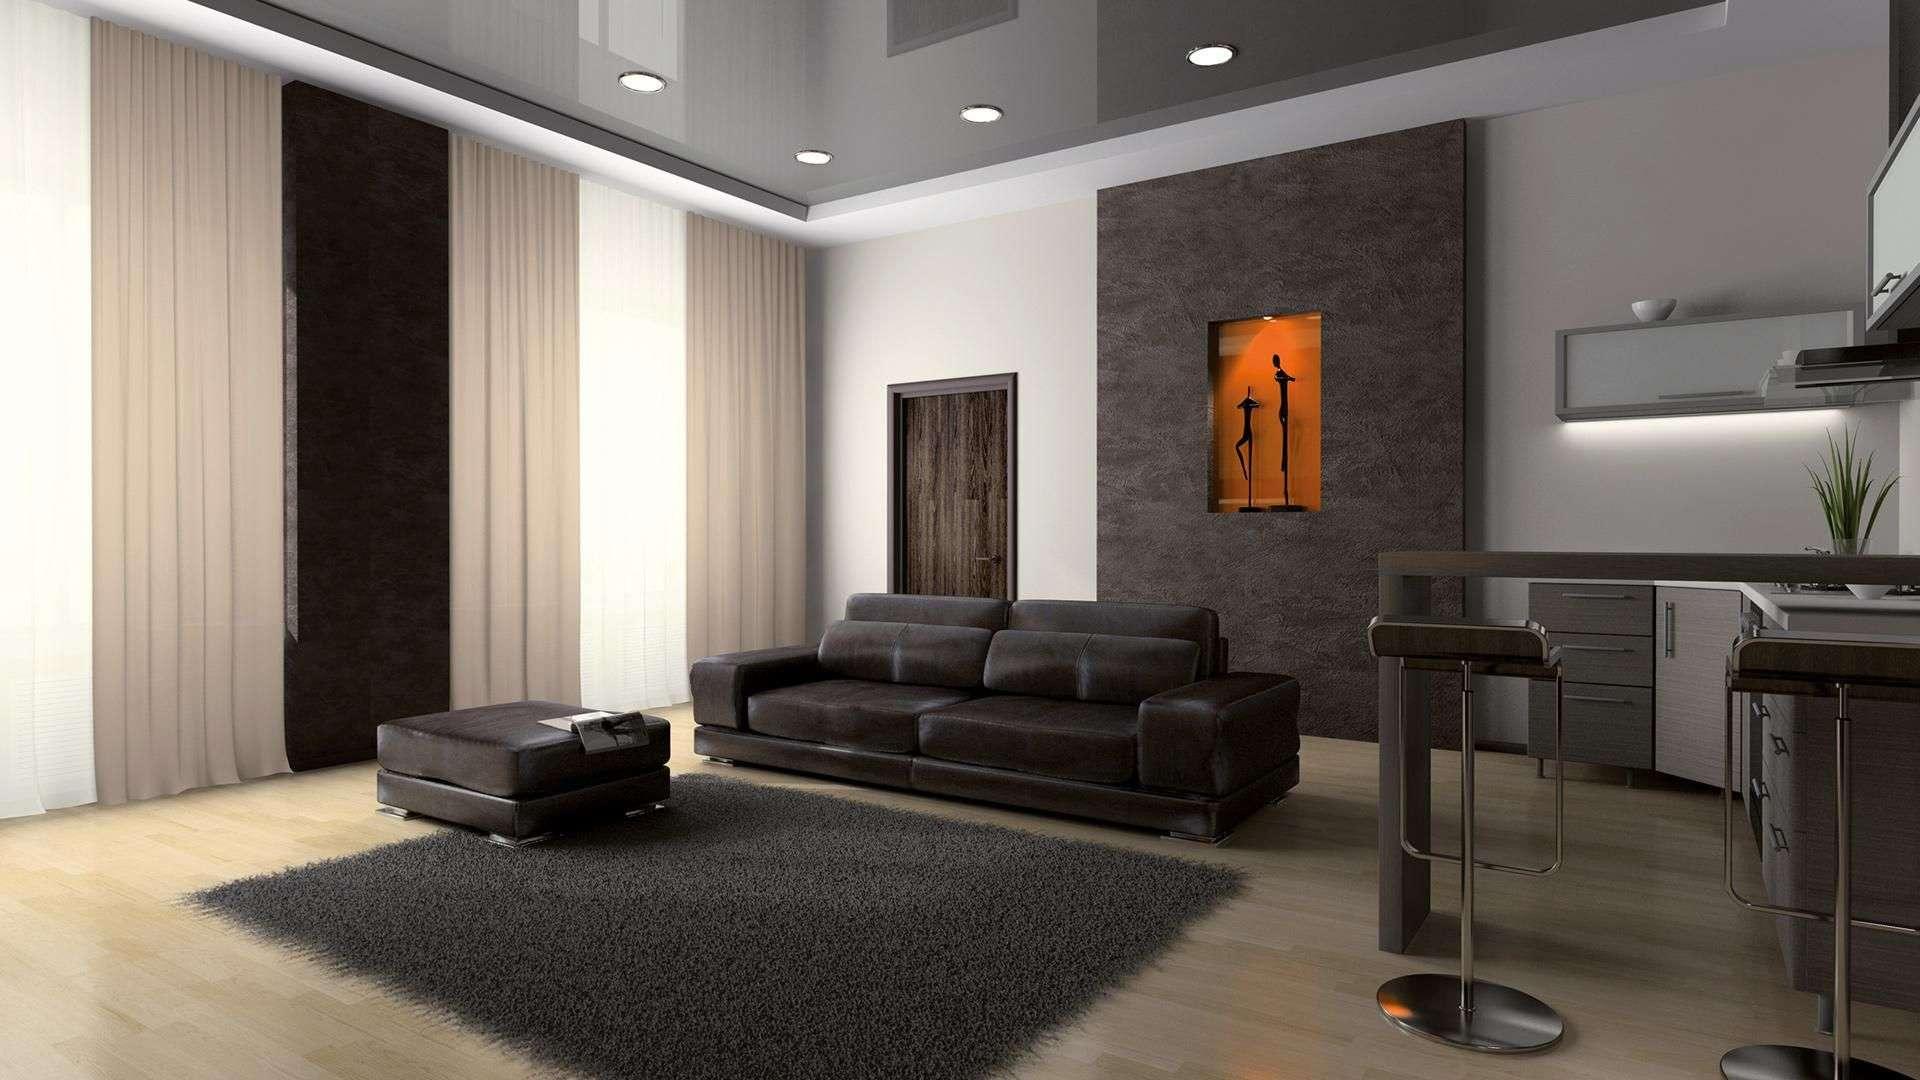 promotec fensterbau gmbh beschattung. Black Bedroom Furniture Sets. Home Design Ideas